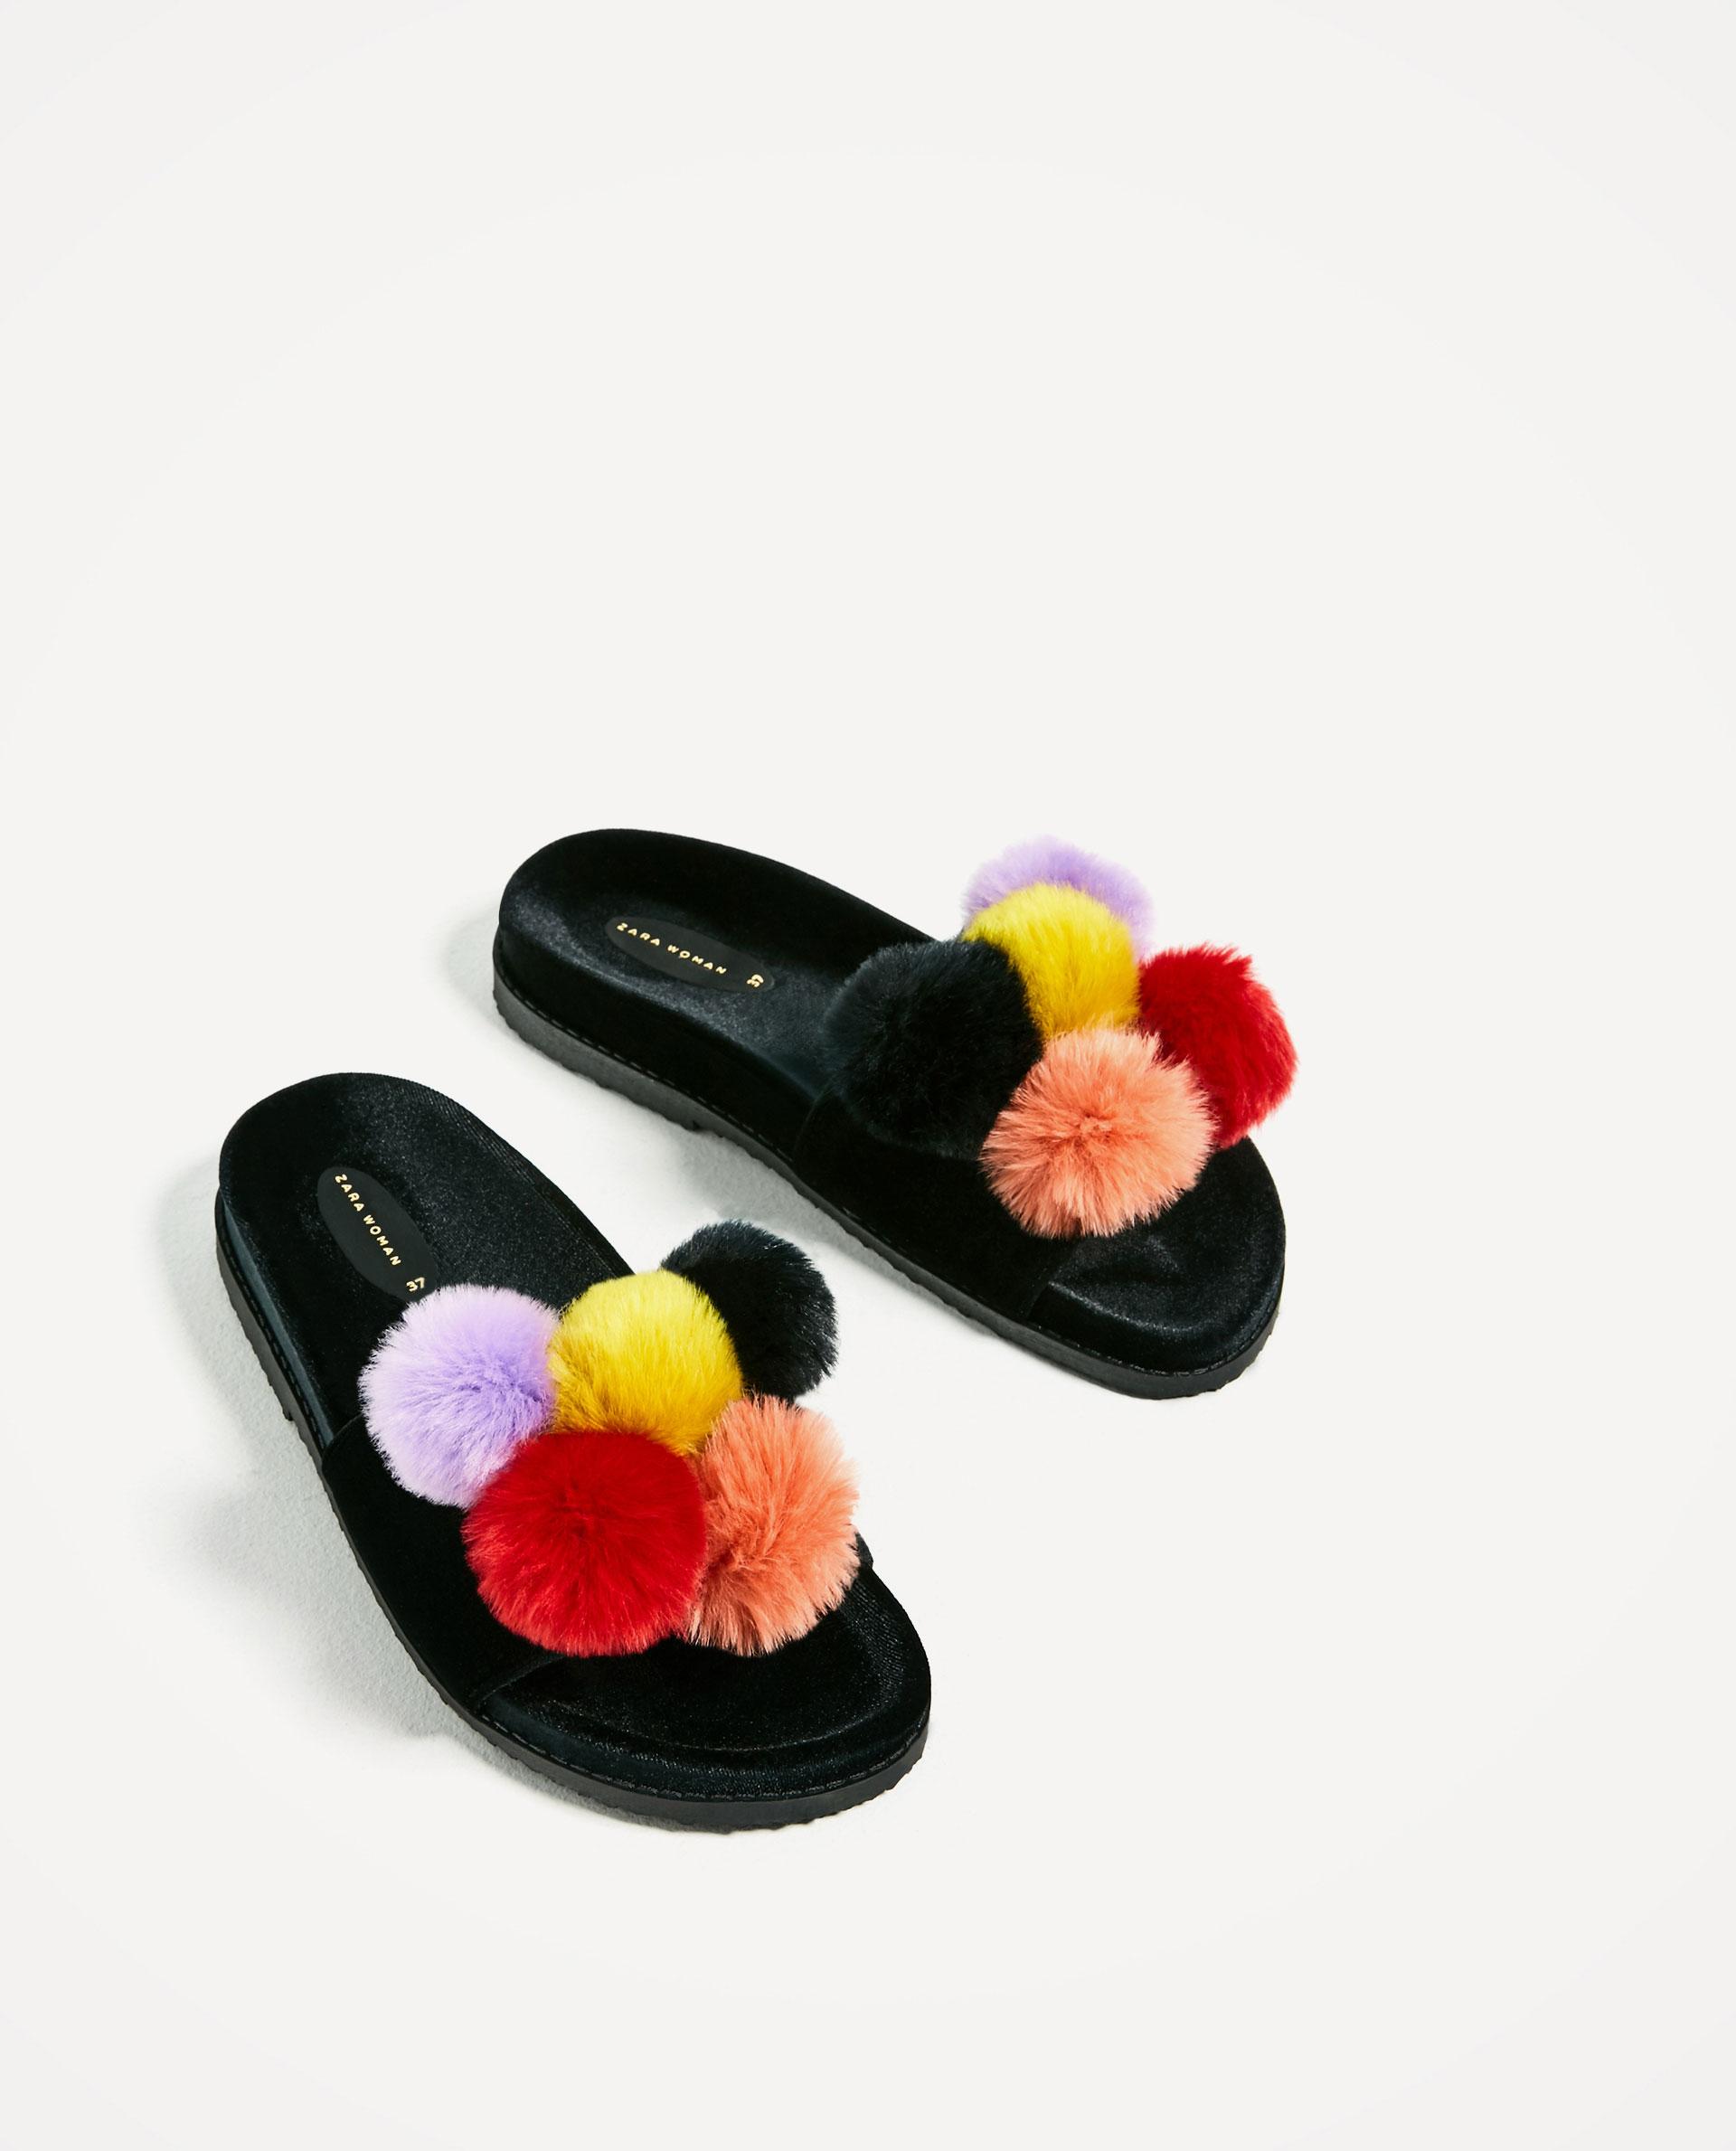 sandalias pompones Zara